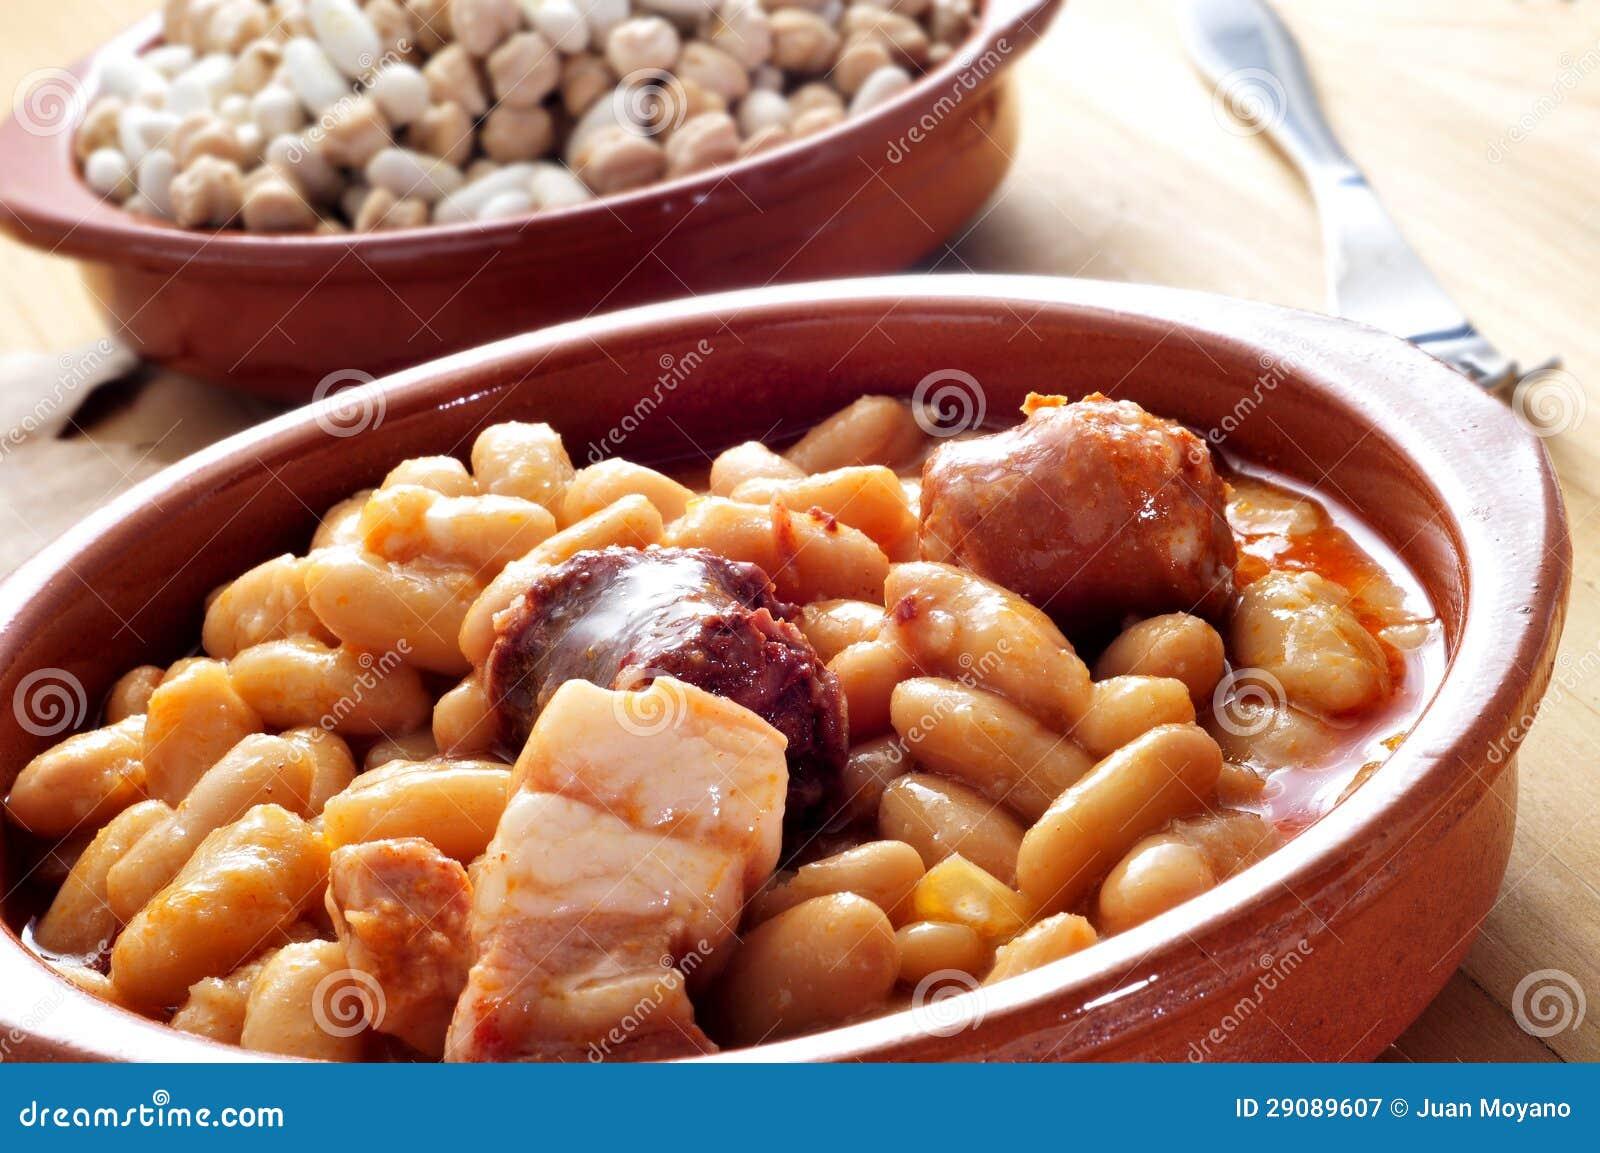 Fabada asturiana typical spanish bean stew stock image for Asturian cuisine